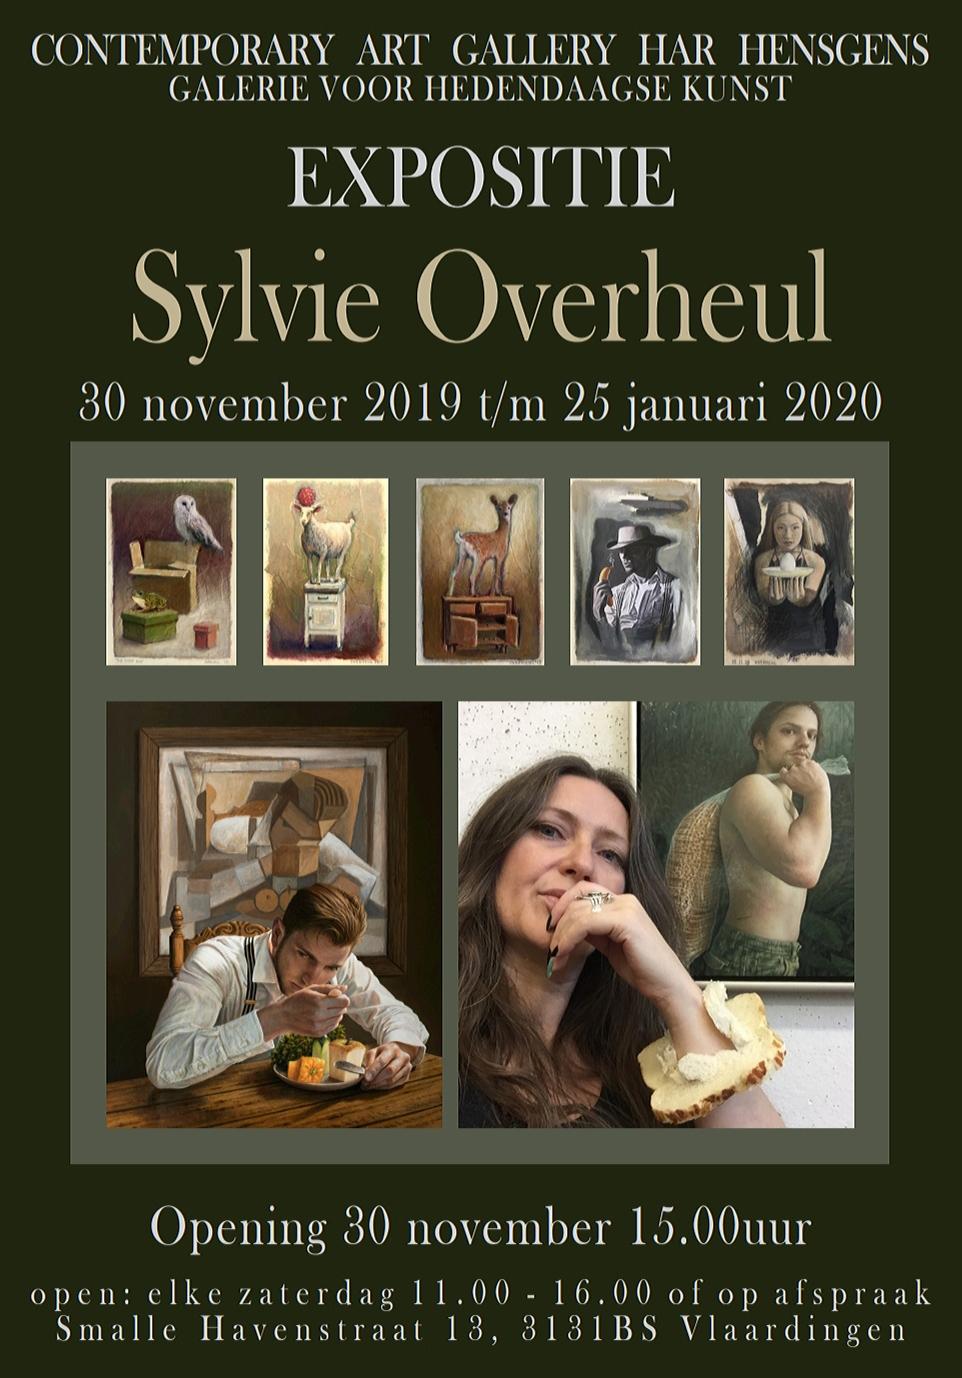 expositie Sylvie Overheul